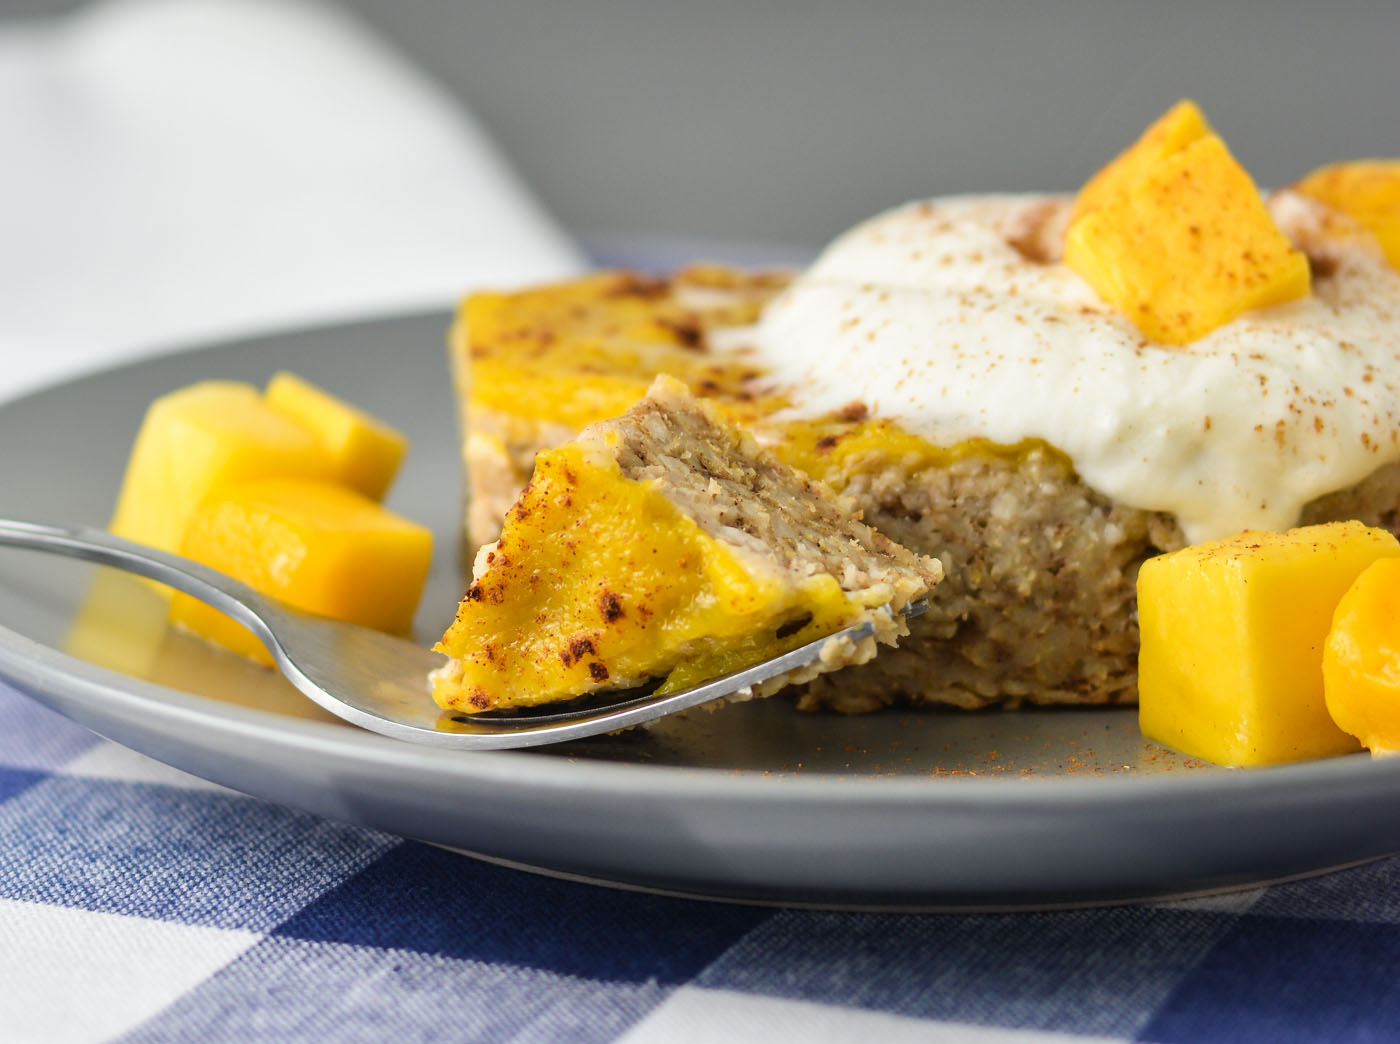 Mango Baked Oatmeal (Or Mango Ginger Cardamom Oat Cake, if you prefer) | THM E, No Sugar Added, Low Fat, Gluten Free, Dairy Free